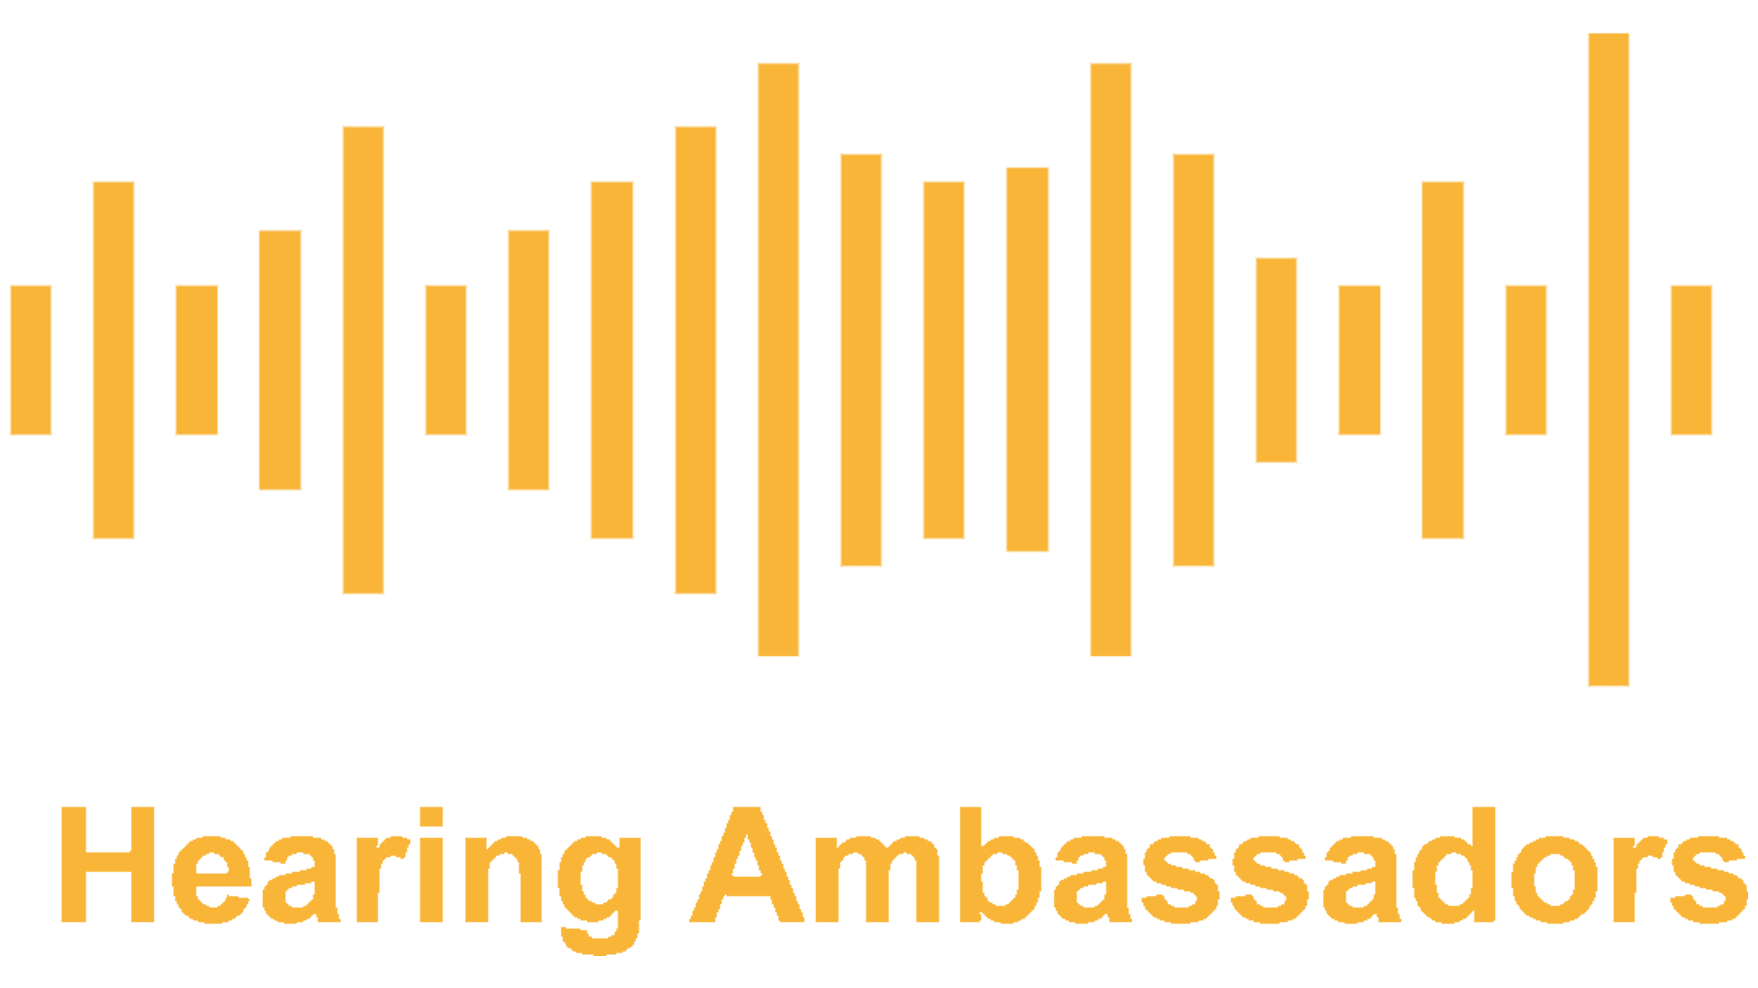 Hearing Ambassadors logo, gold